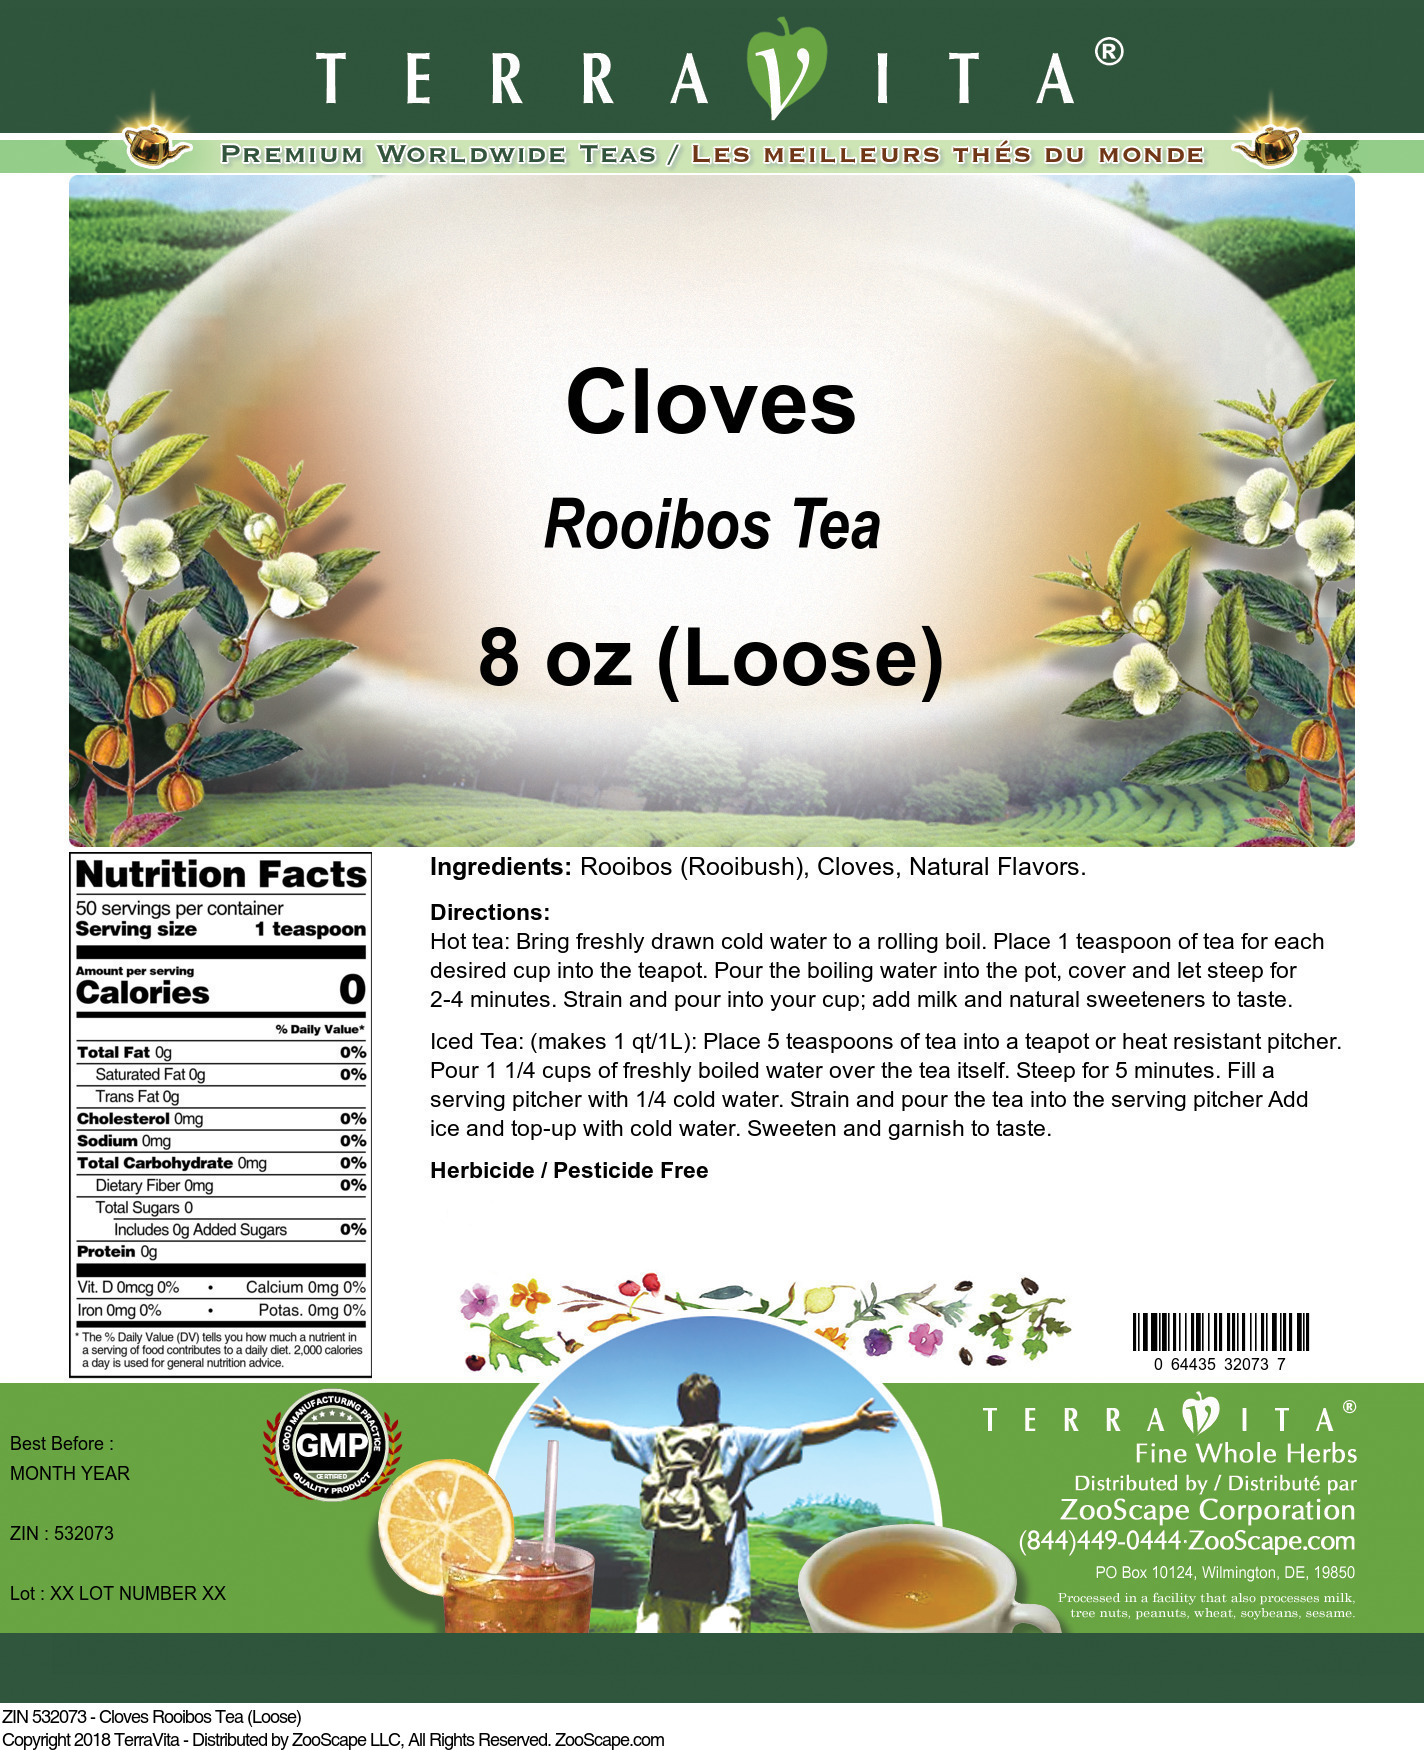 Cloves Rooibos Tea (Loose)